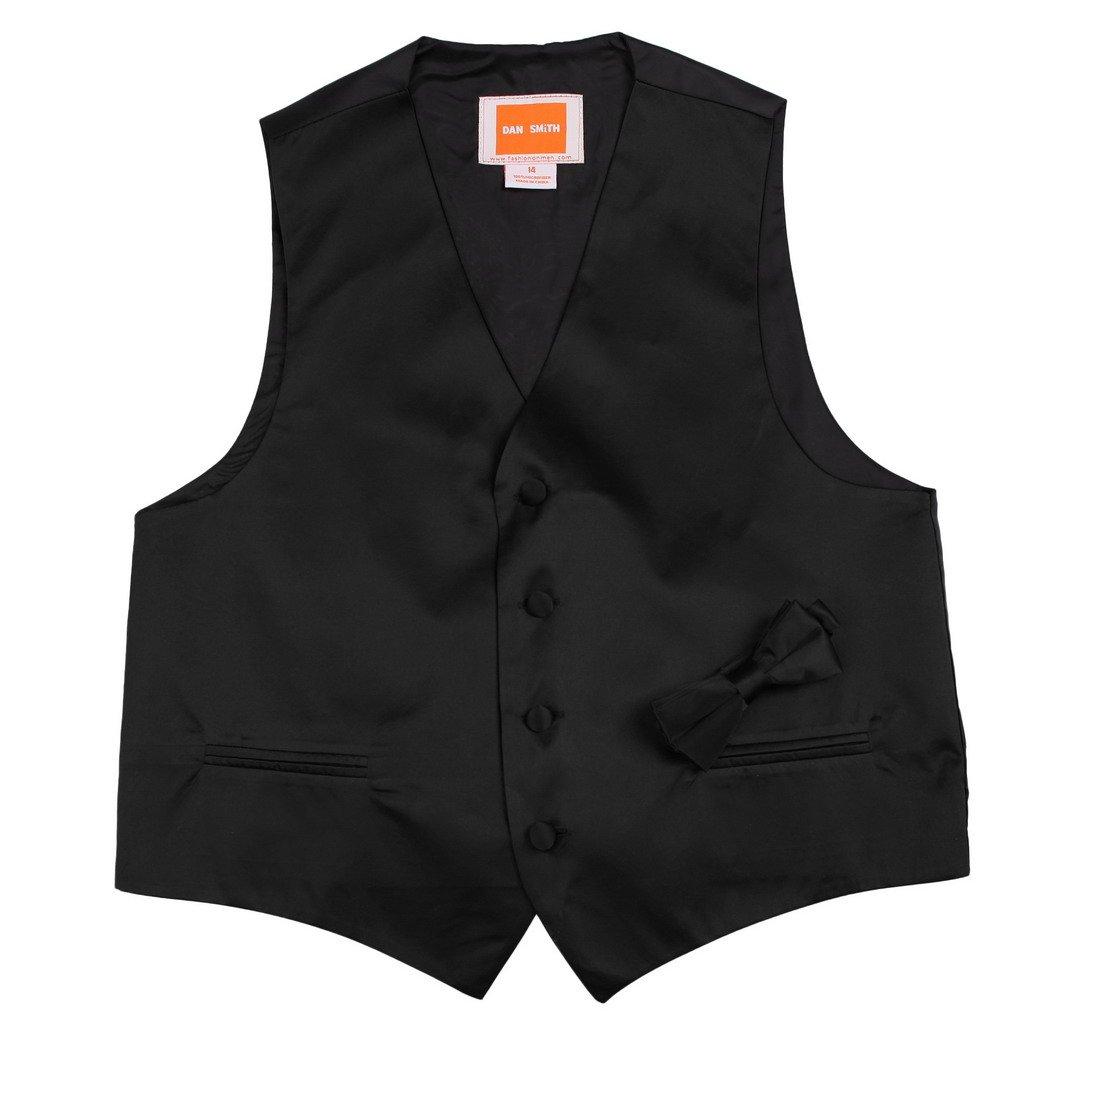 Boys Plain Waistcoat Microfiber Fine World Children Vest with Matching Bow Tie,Black,Size 10A